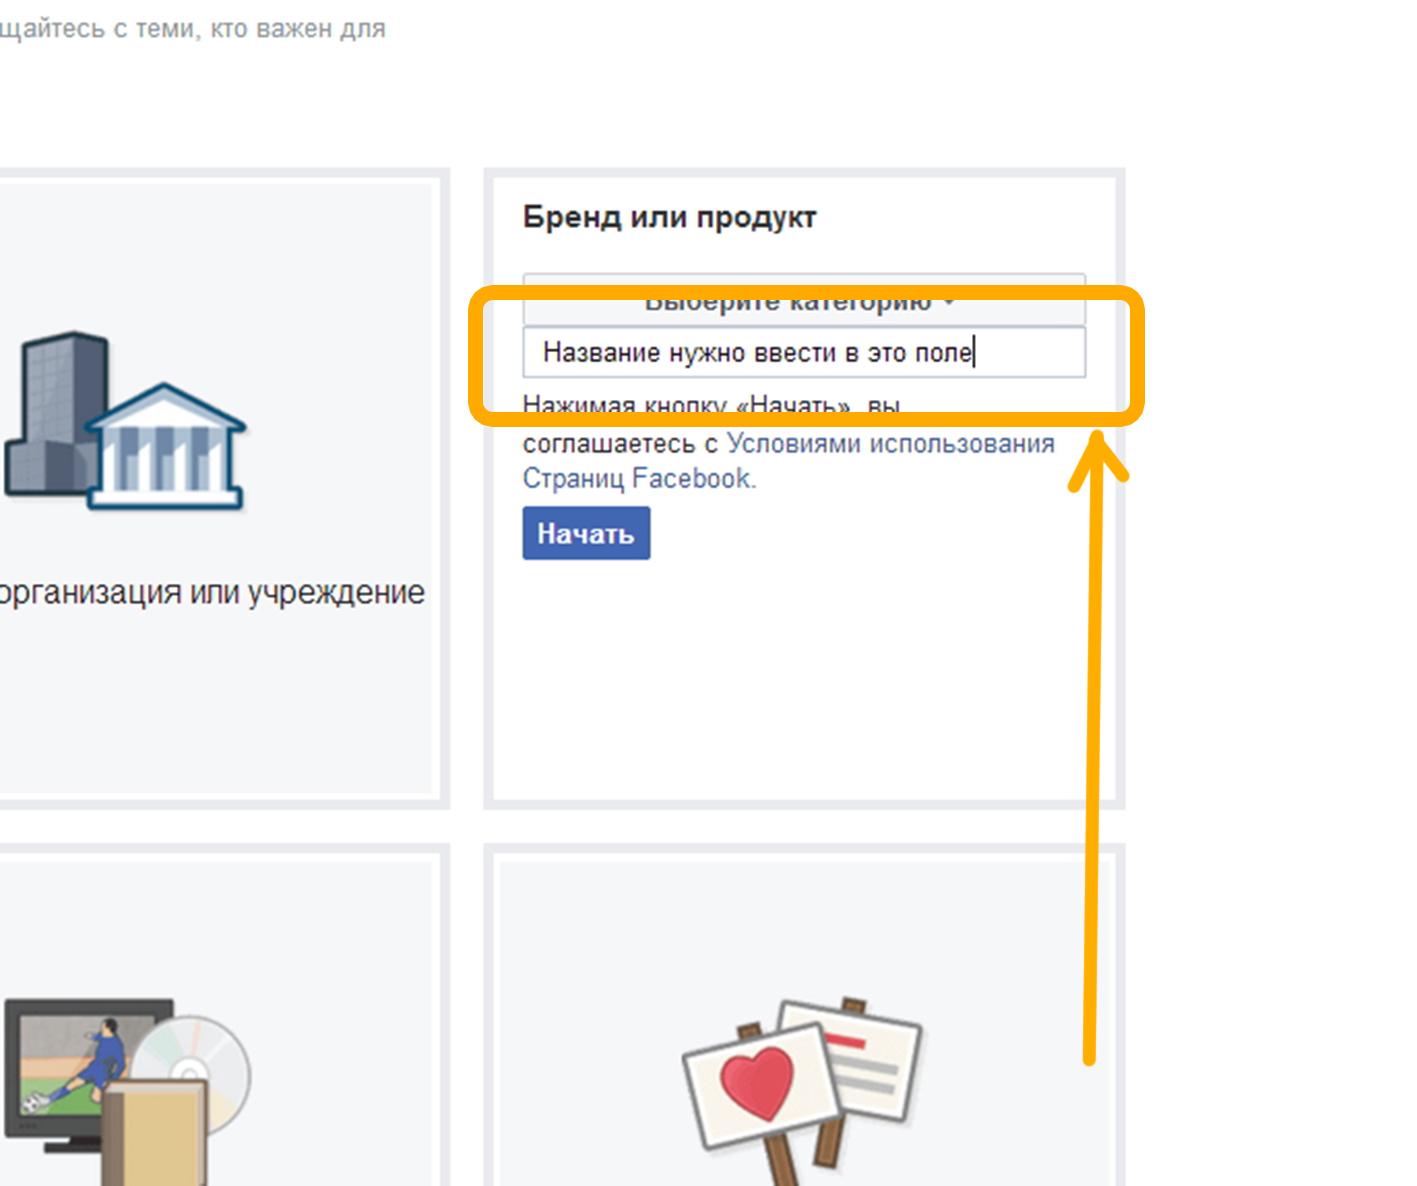 Pole-dla-vvoda-nazvania-stranicy-facebook.jpg